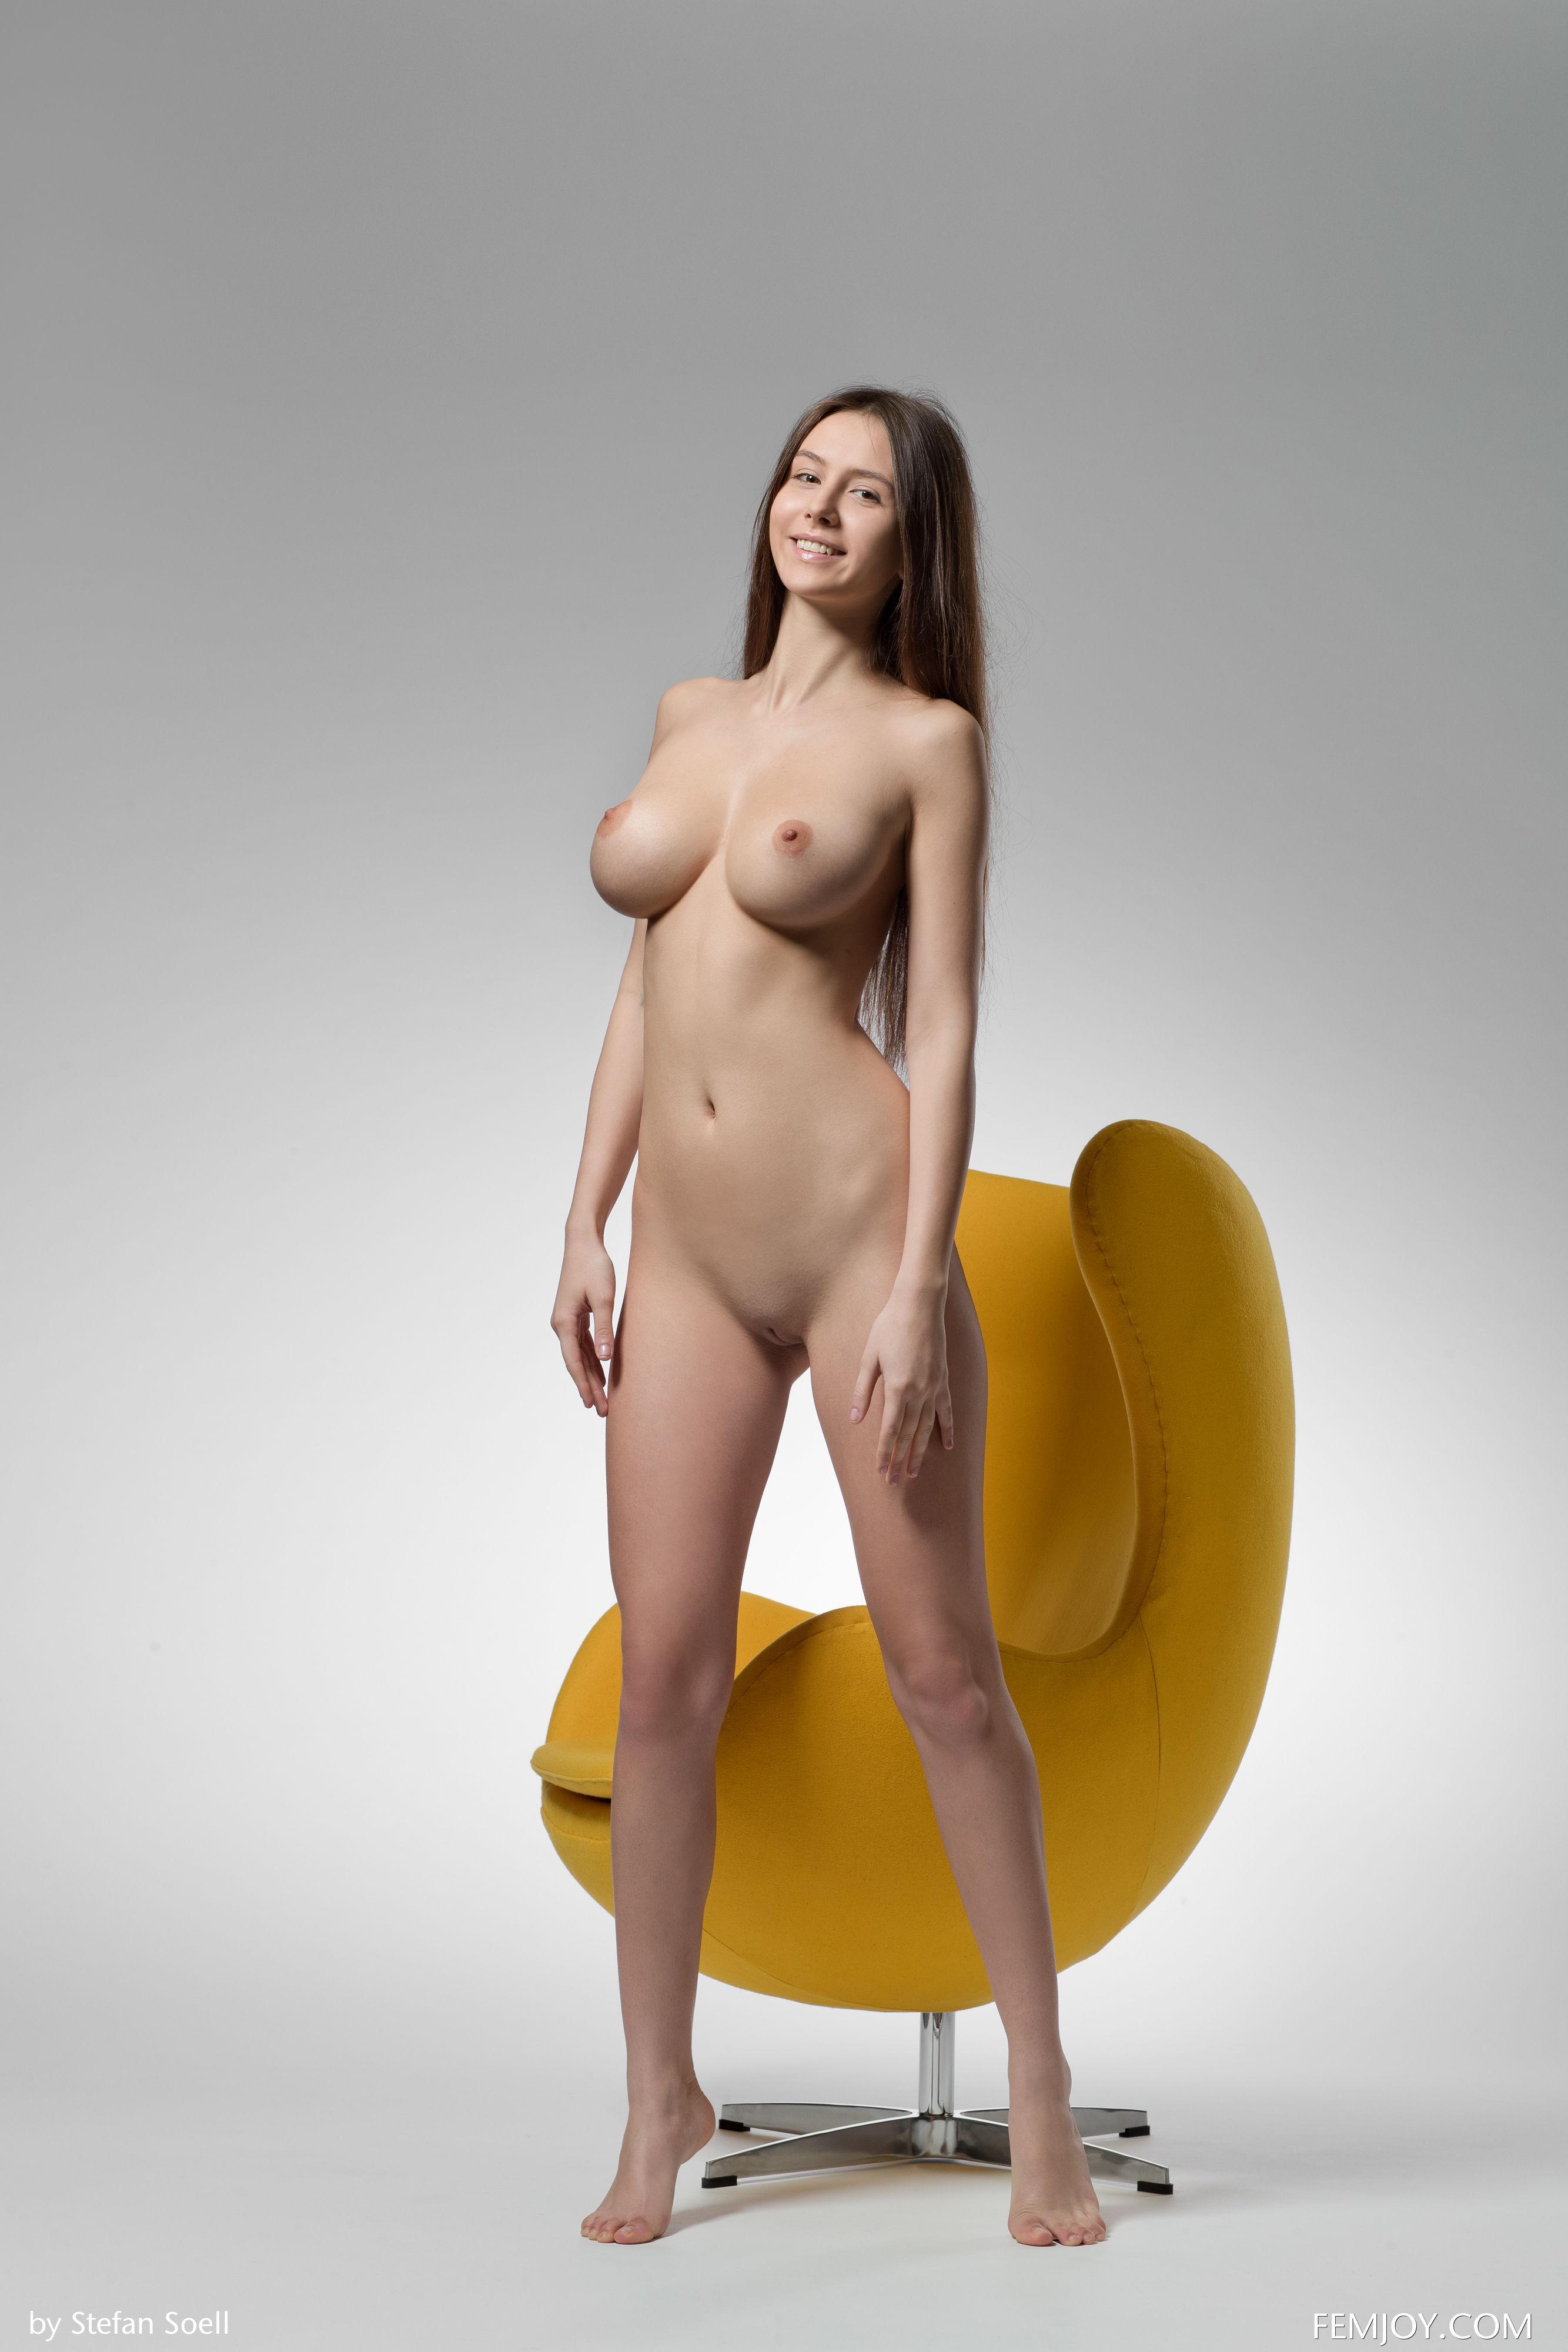 76857648_alisai_femjoy_stefansoell_yellow_19052018p_16.jpg